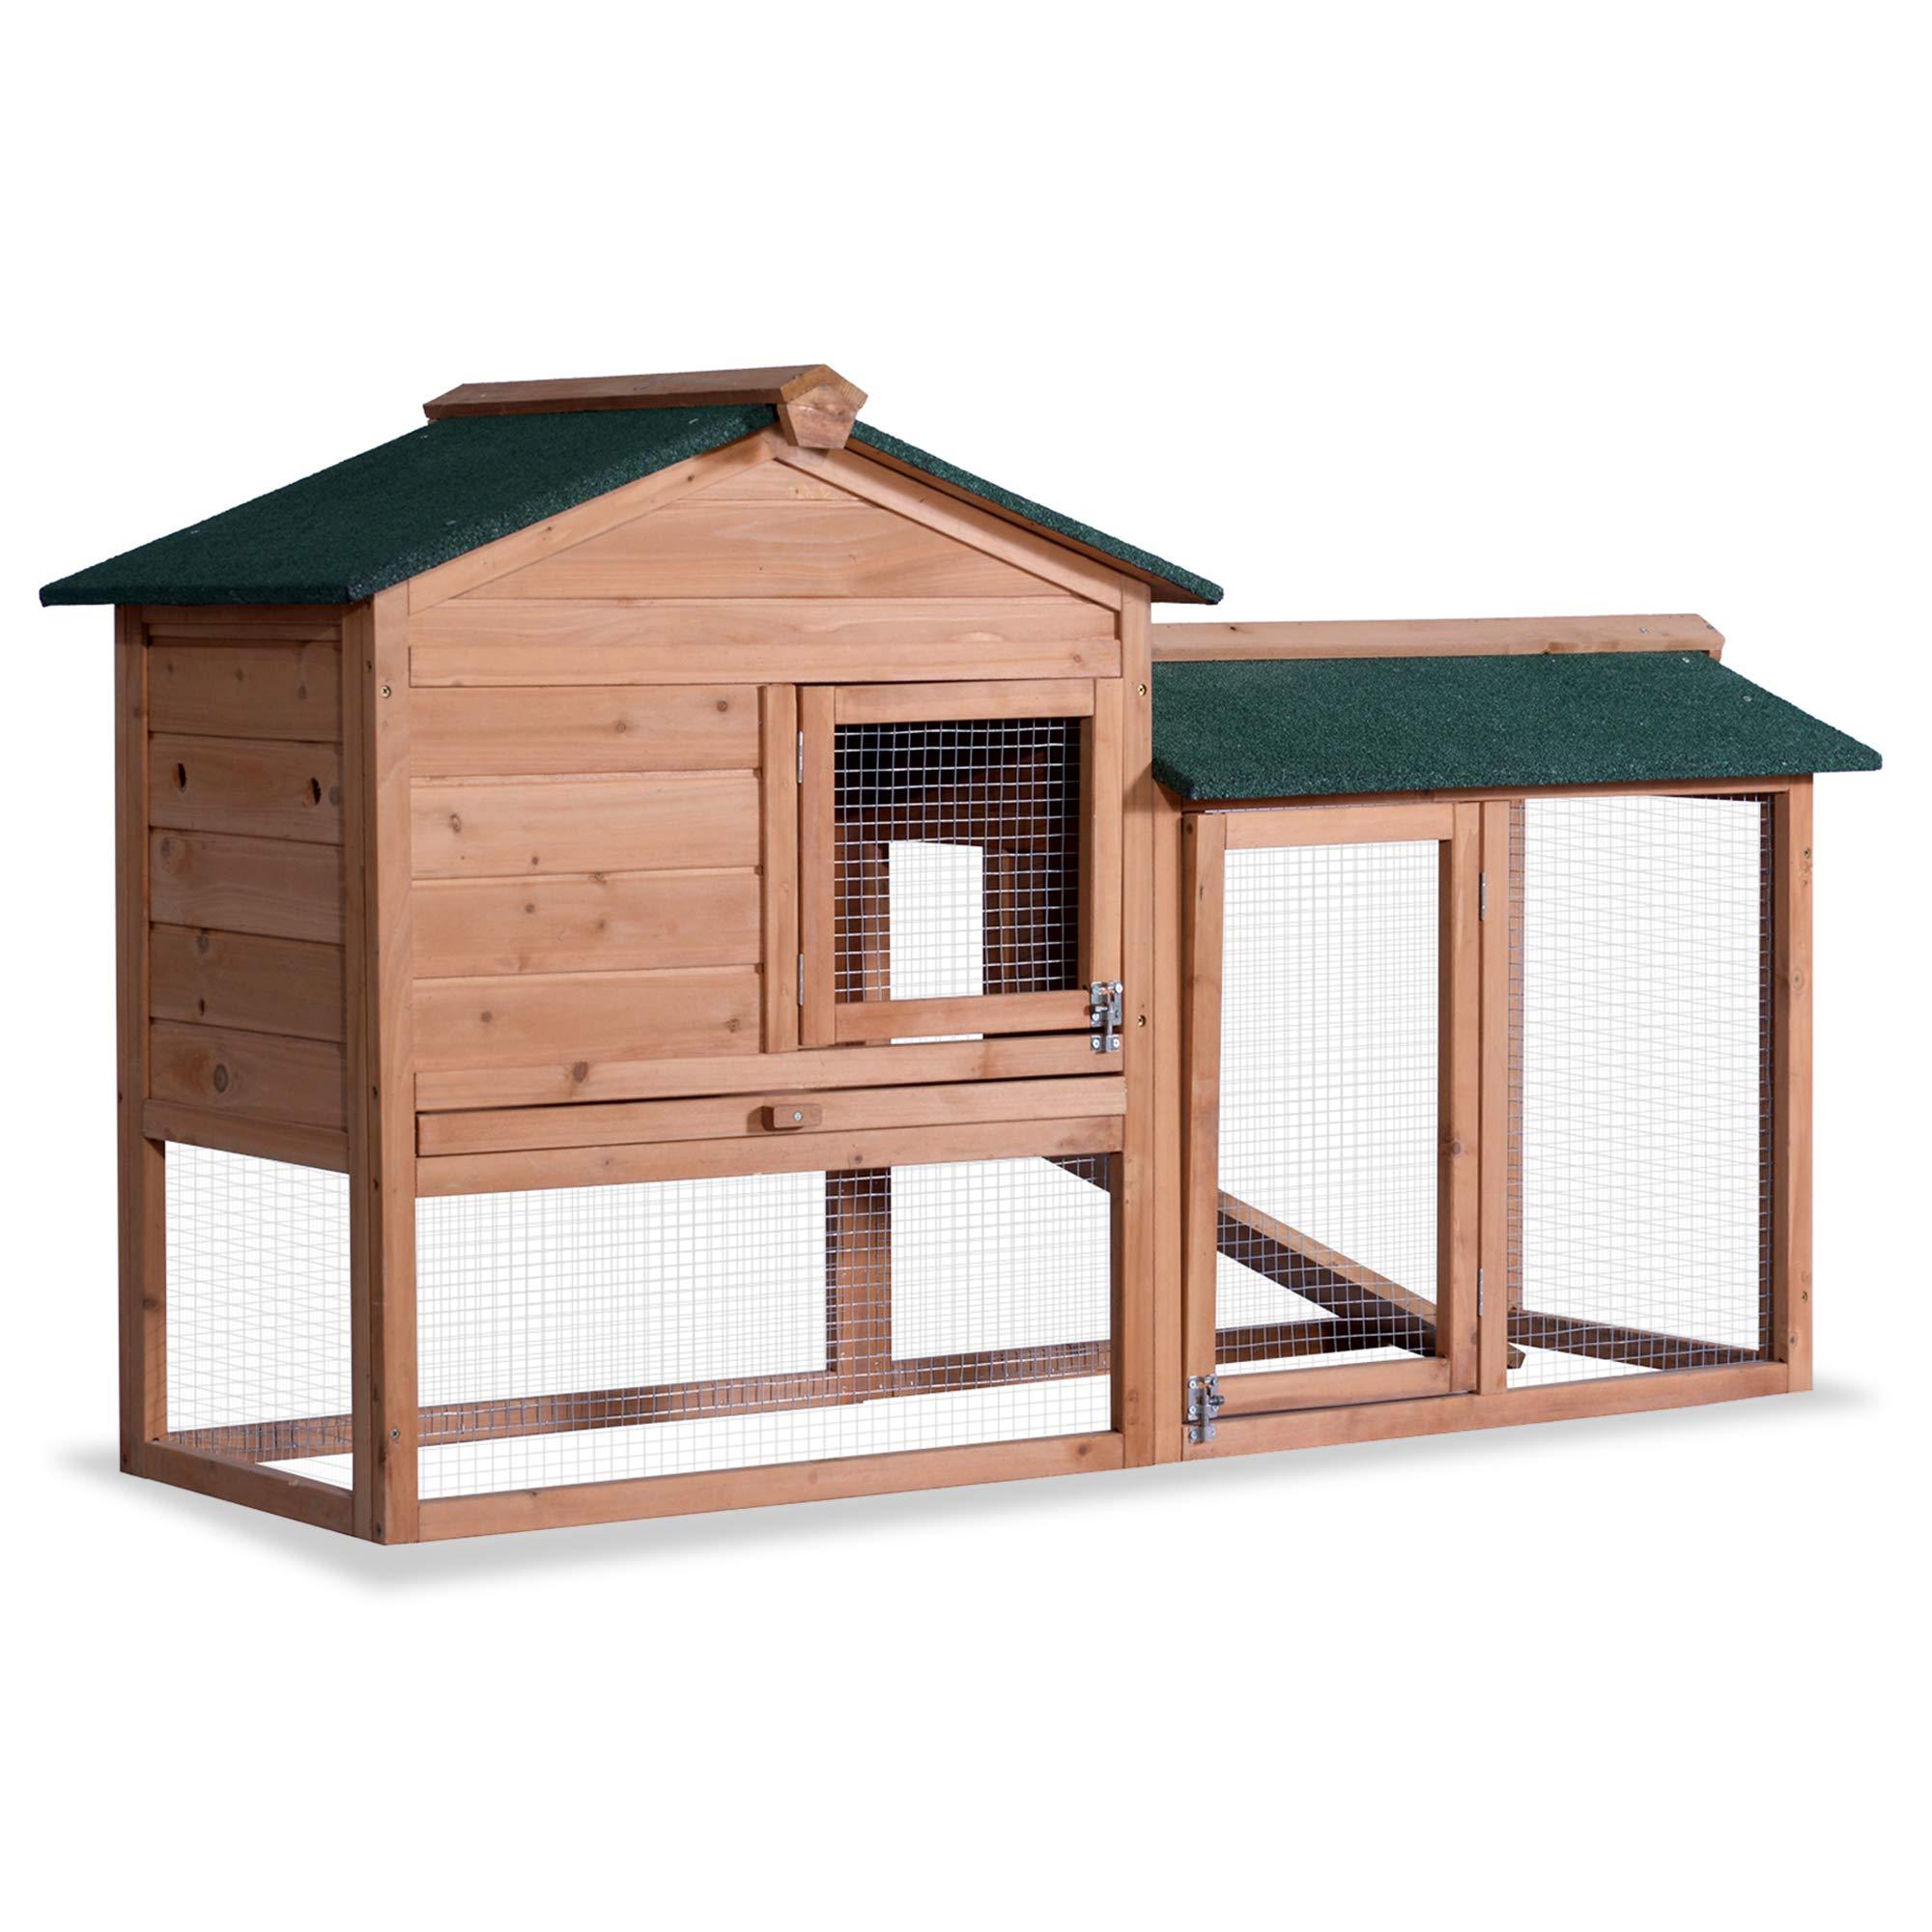 Lovupet 58'' Deluxe Wooden Chicken Coop Hen House Outdoor Backyard Garden Bunny Rabbit Hutch with Ventilation Door, Removable Tray and Ramp 1305 by Exacme